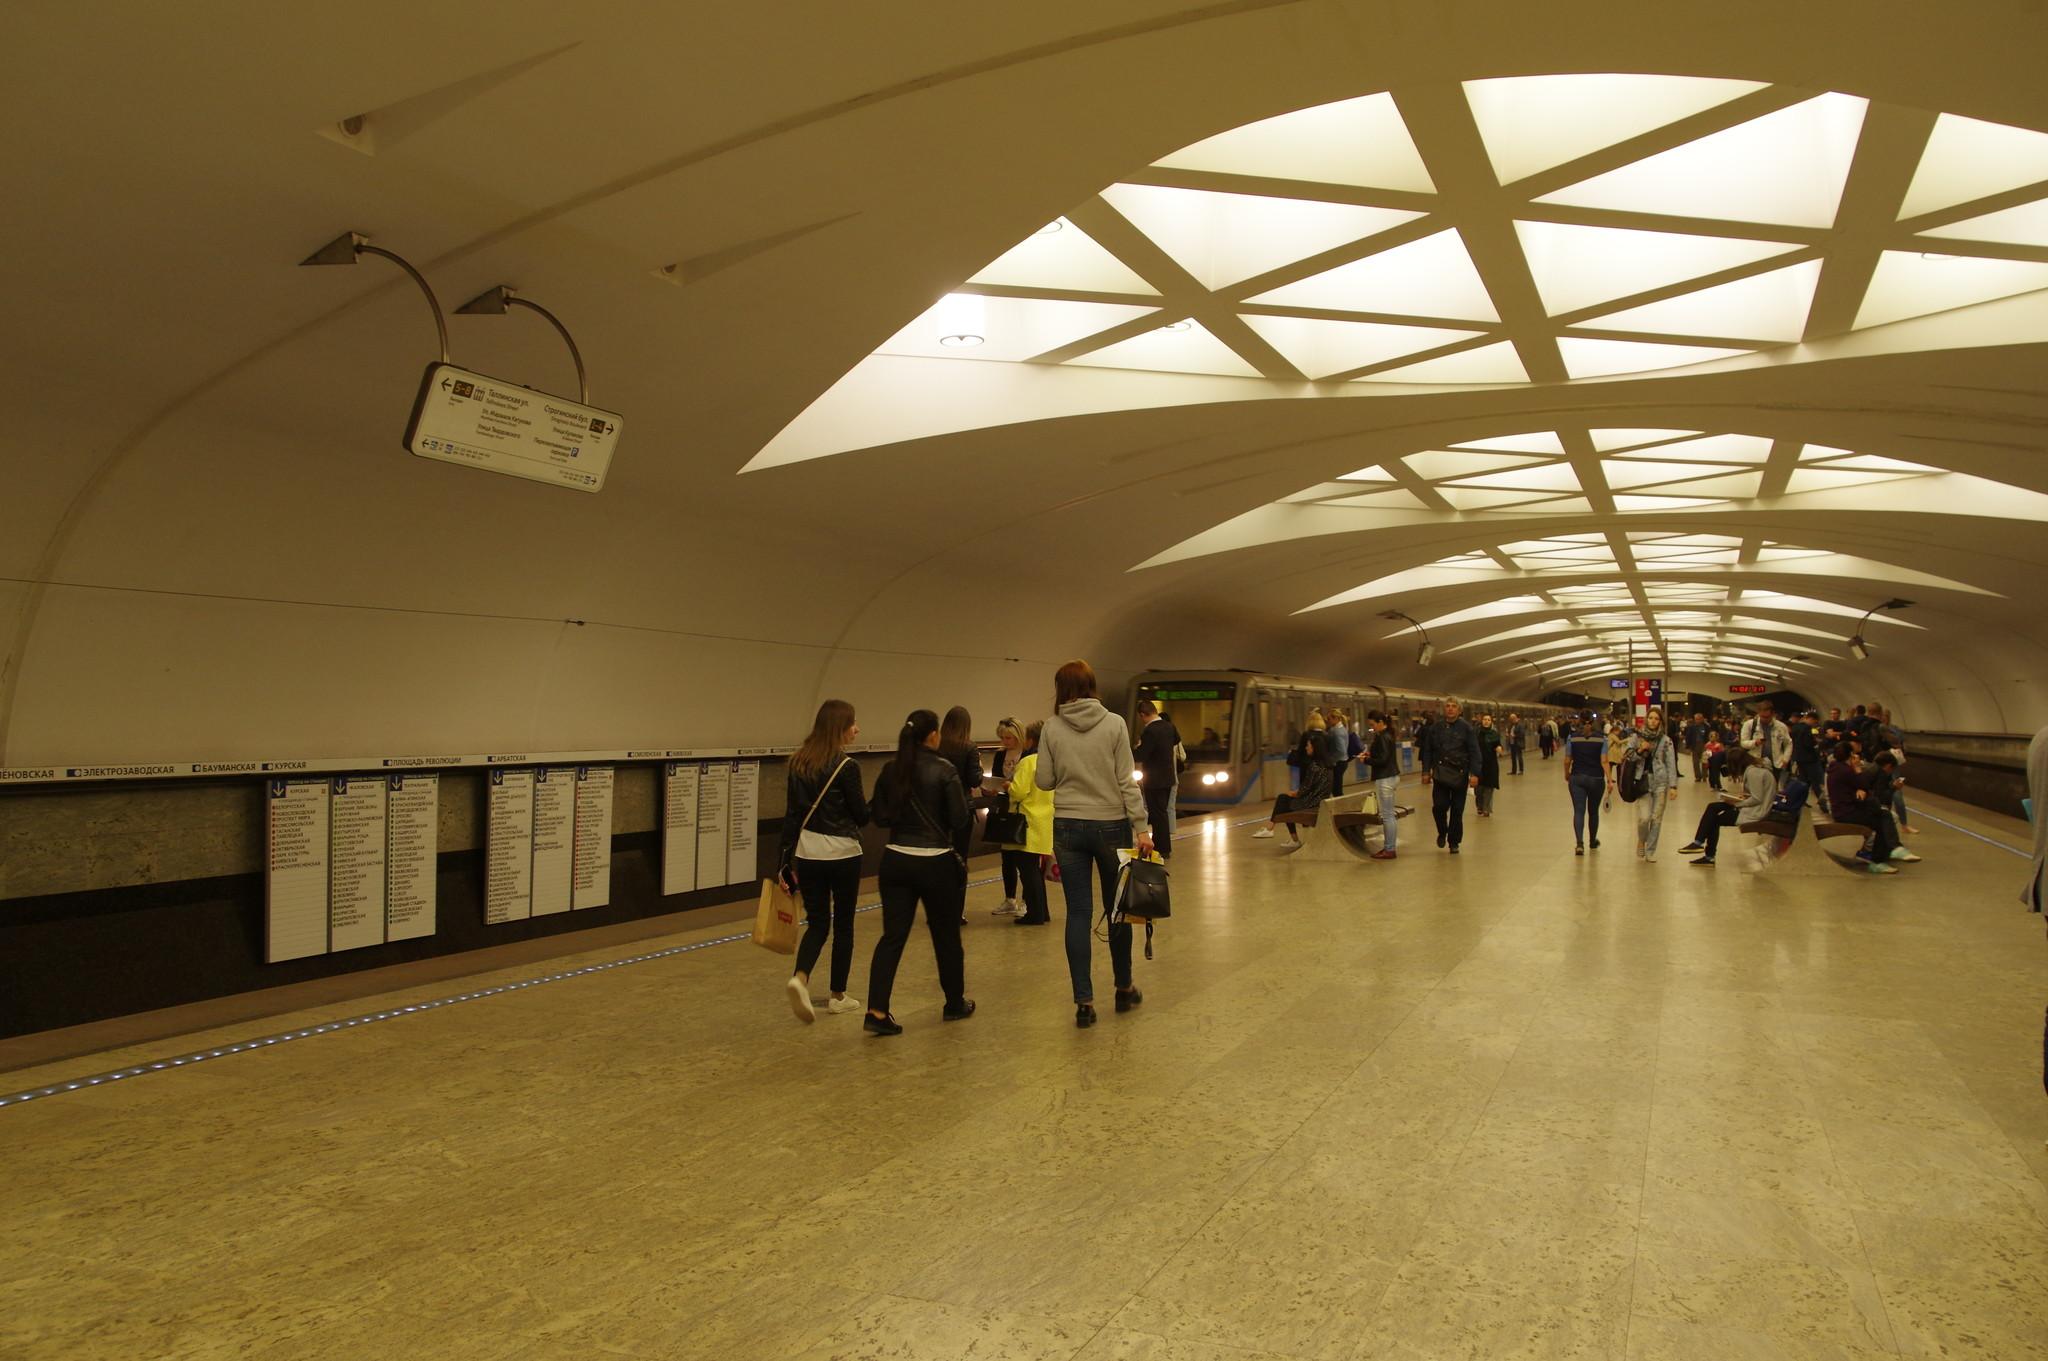 Станция метро «Строгино» Арбатско-Покровской линии Московского метрополитена